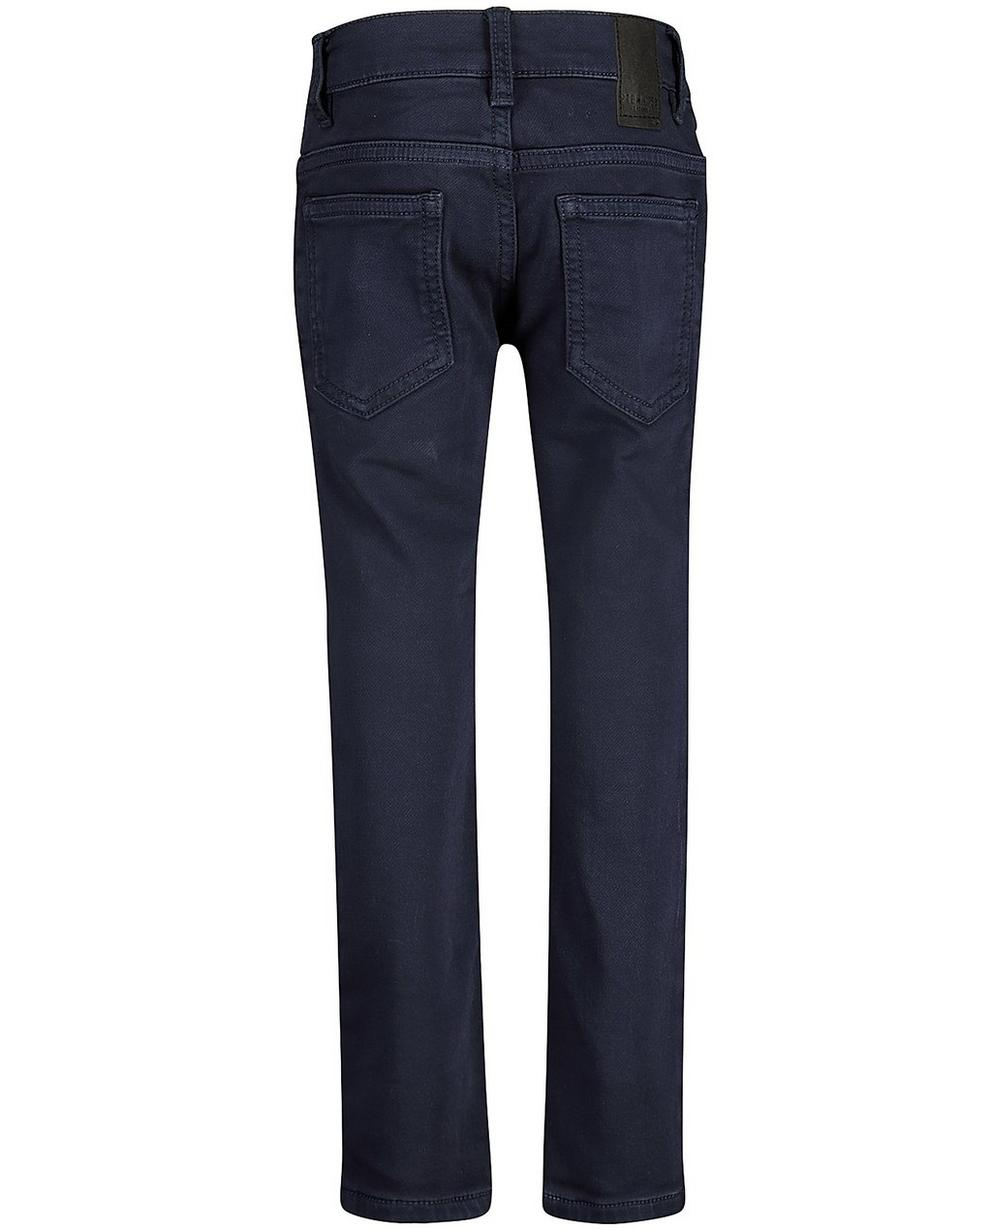 Hosen - Navy - Skinny Jeans JOEY, 2-7 Jahre